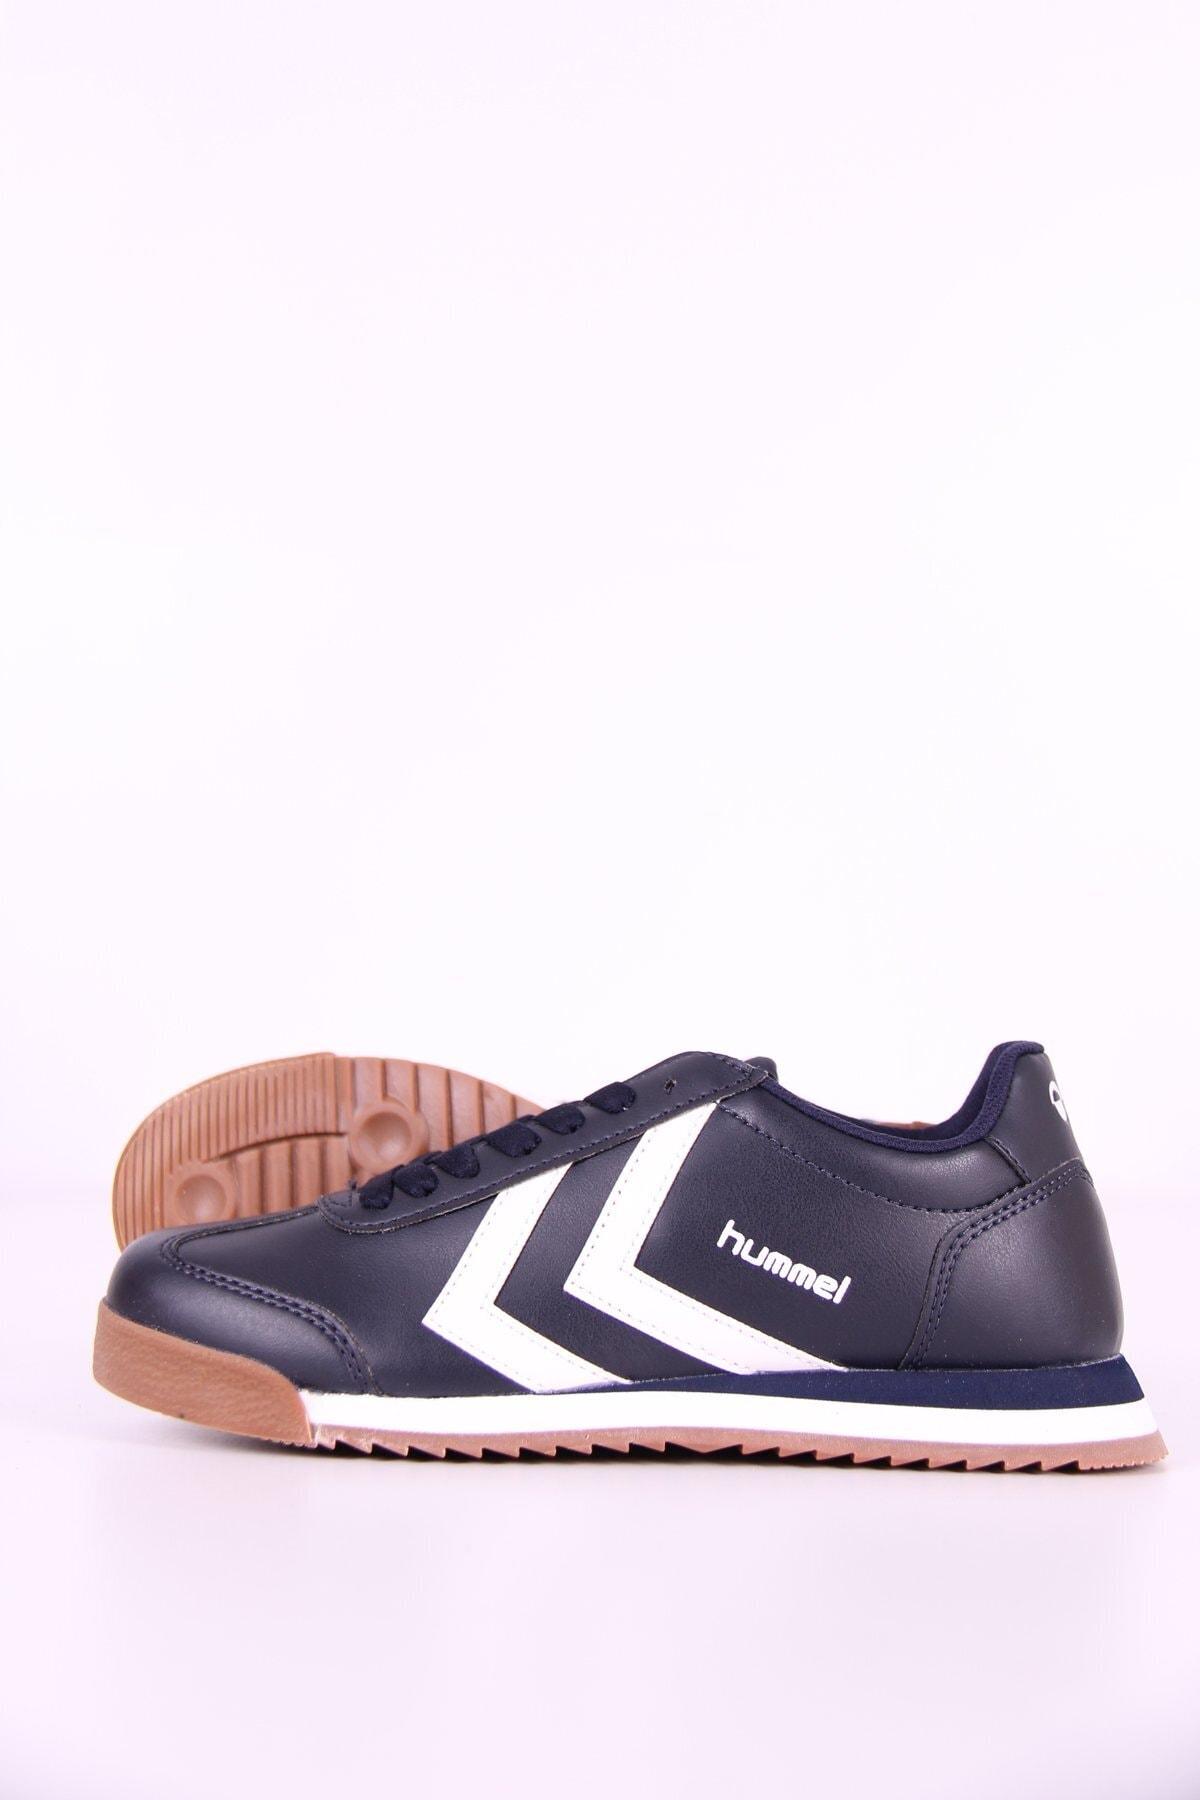 HUMMEL MESSMER 23 Mavi Erkek Sneaker Ayakkabı 100352001 1